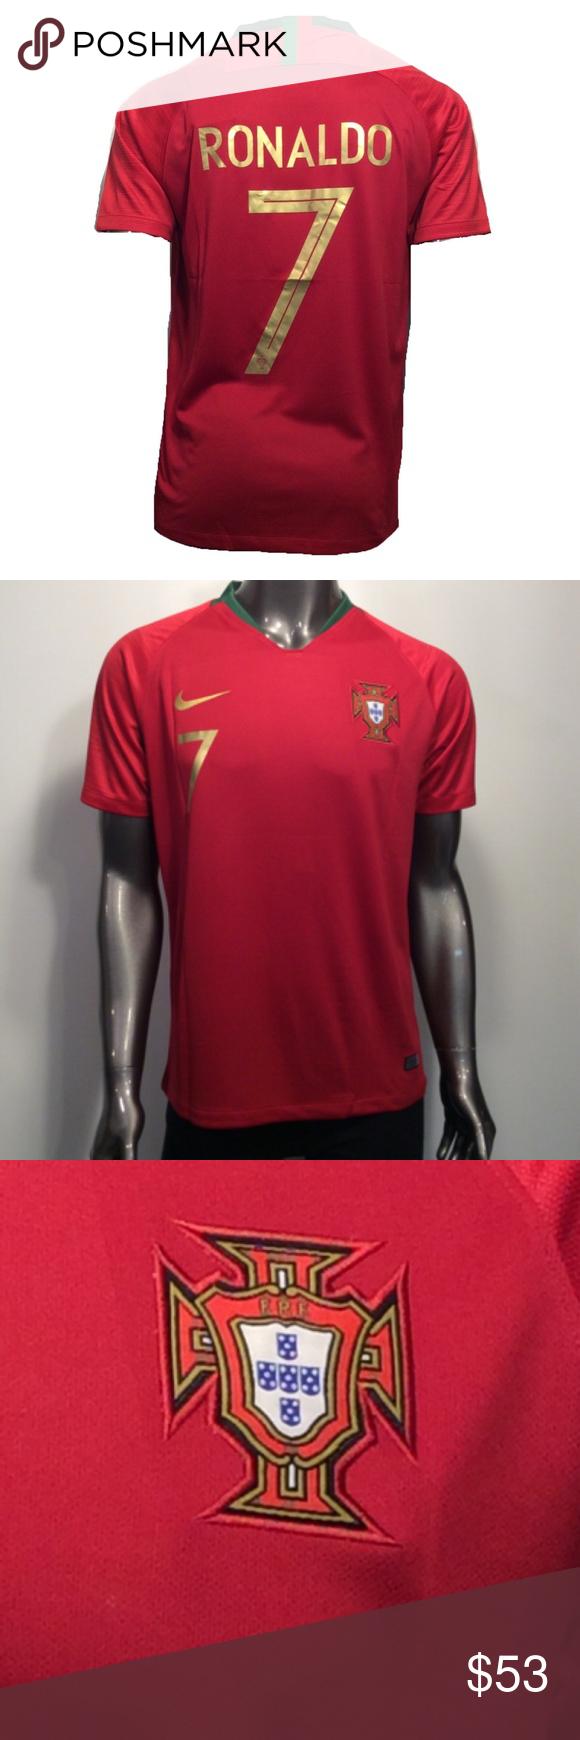 2018 World Cup Cristiano Ronaldo Xl Soccer Jersey 2018 World Cup Nike Portugal Cristiano Ronaldo 7 Xl Home Soccer Jers Soccer Jersey Ronaldo Cristiano Ronaldo